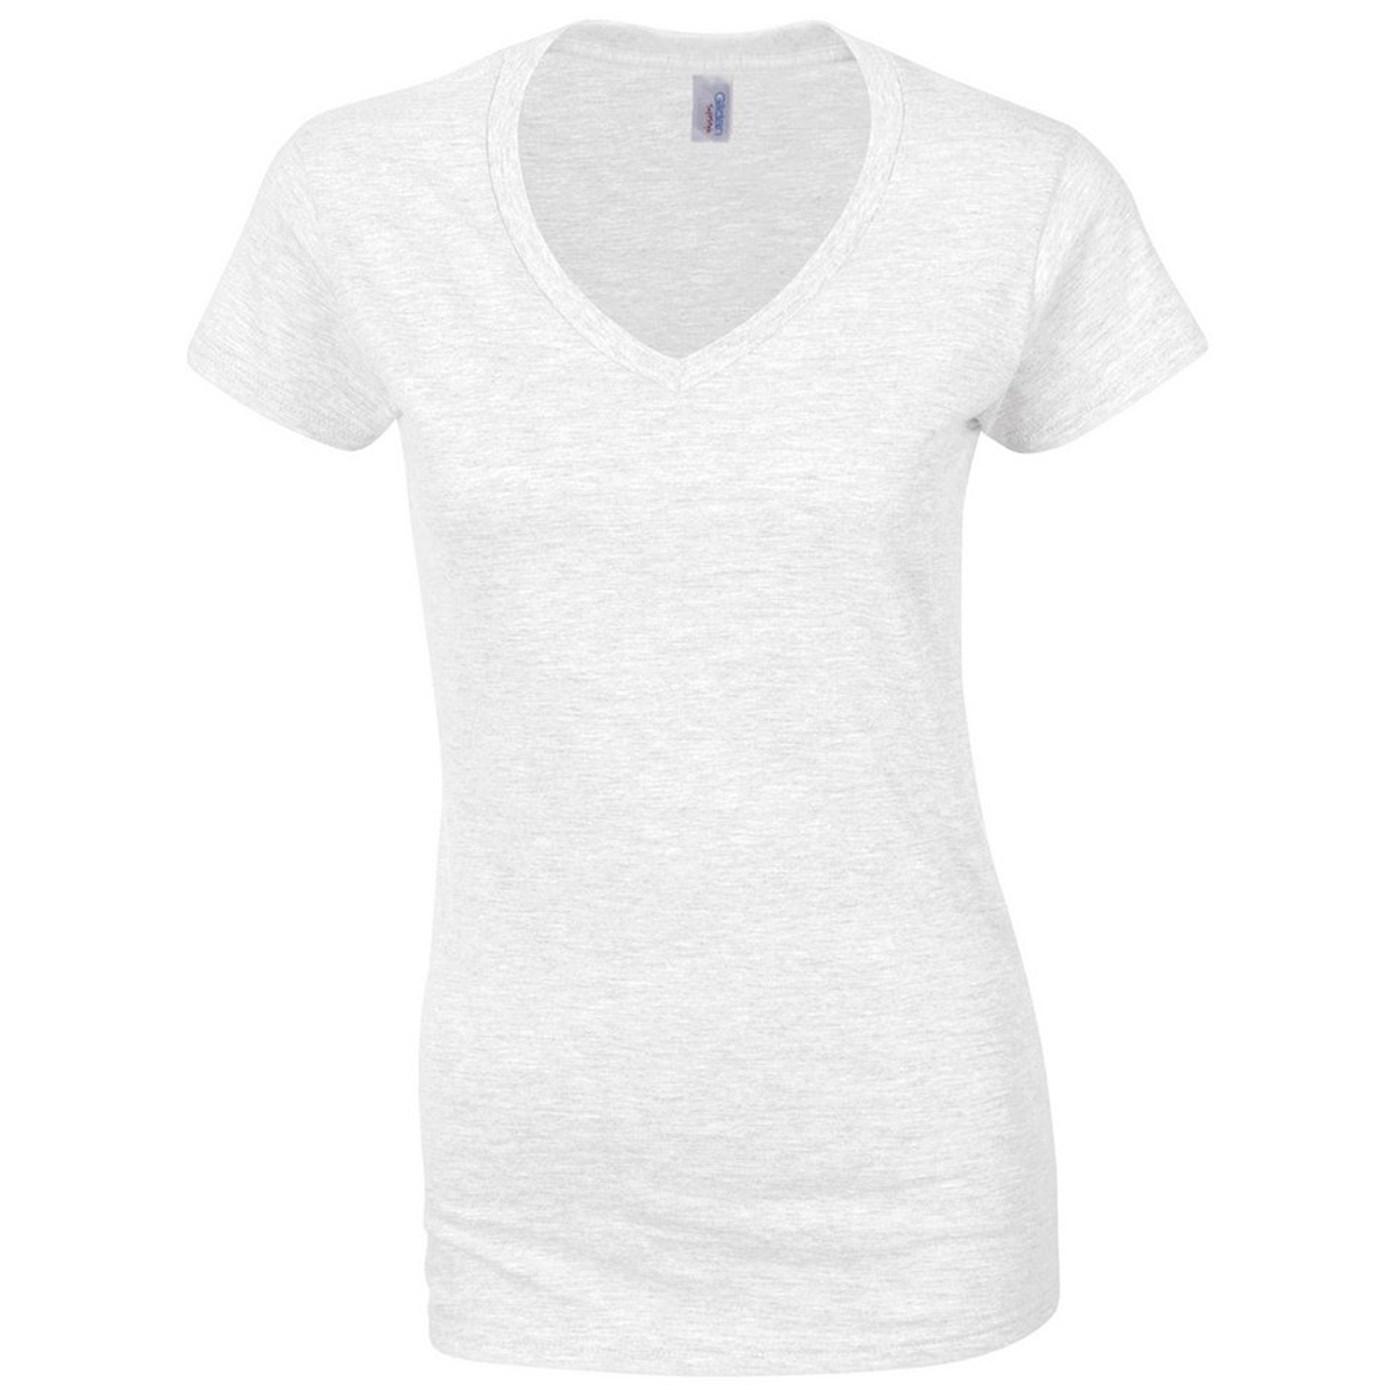 3fa4cdcb65b6 Gildan Ladies Softstyle V-Neck T-Shirt GD078